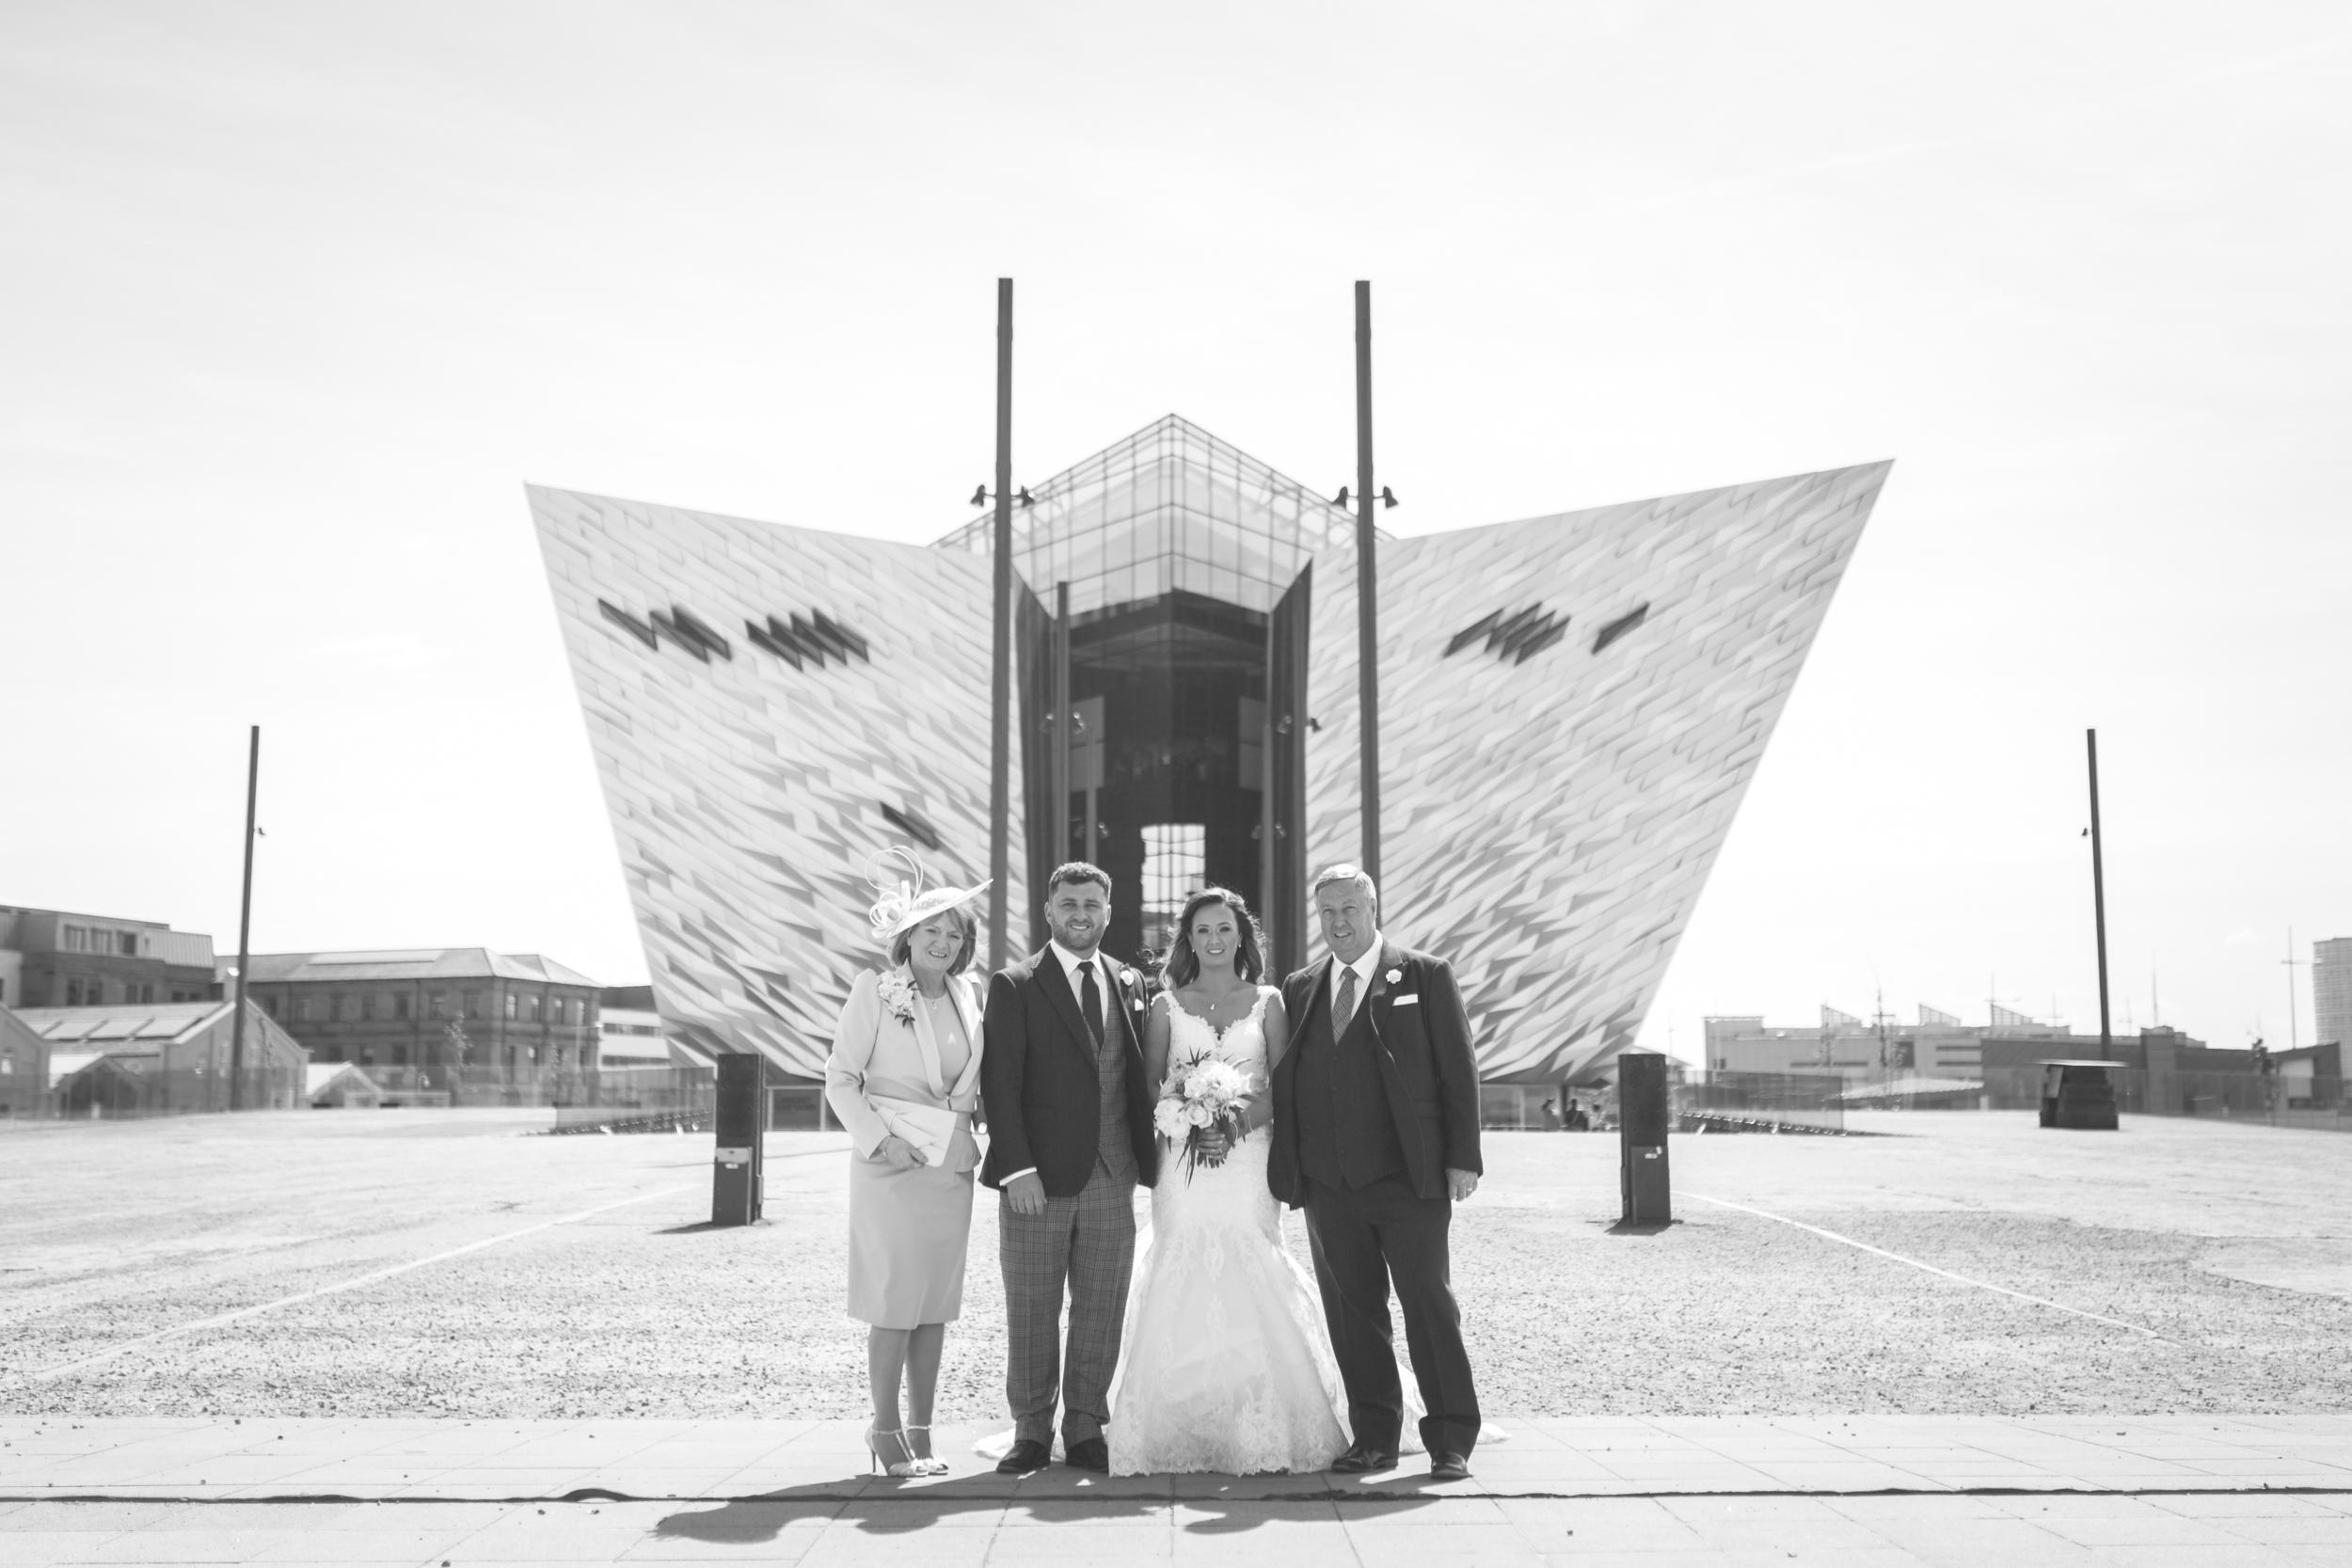 Brian McEwan   Northern Ireland Wedding Photographer   Rebecca & Michael   Portraits-32.jpg